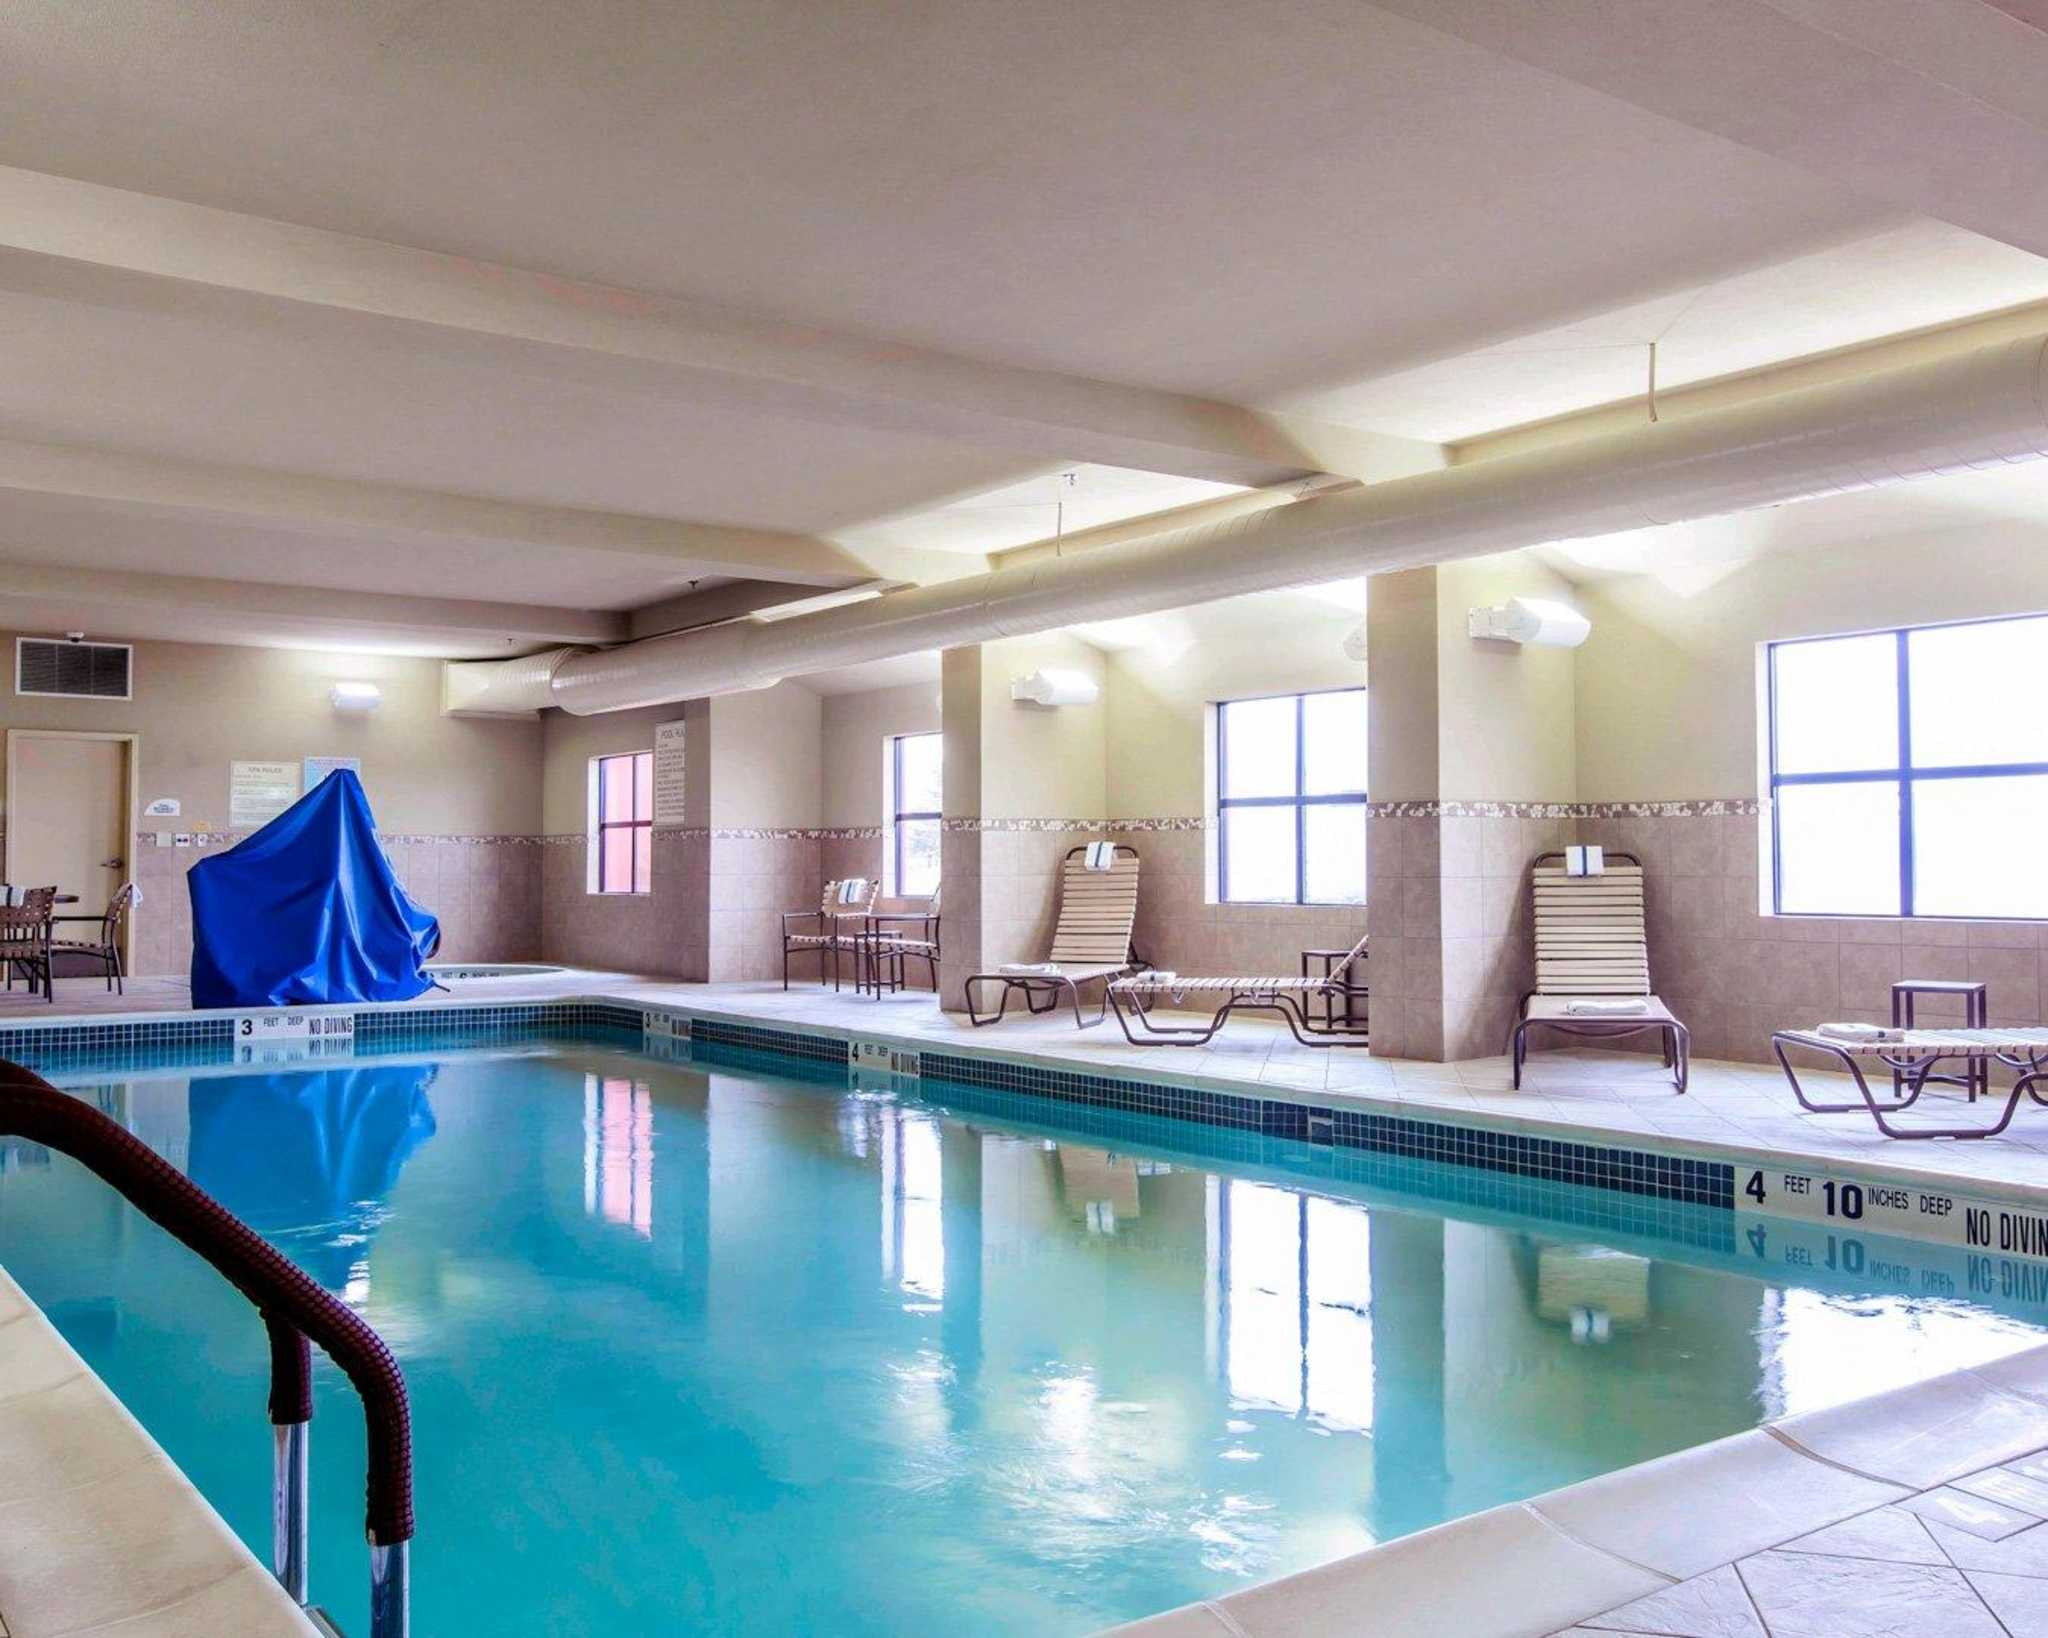 Comfort Inn & Suites adj to Akwesasne Mohawk Casino image 26